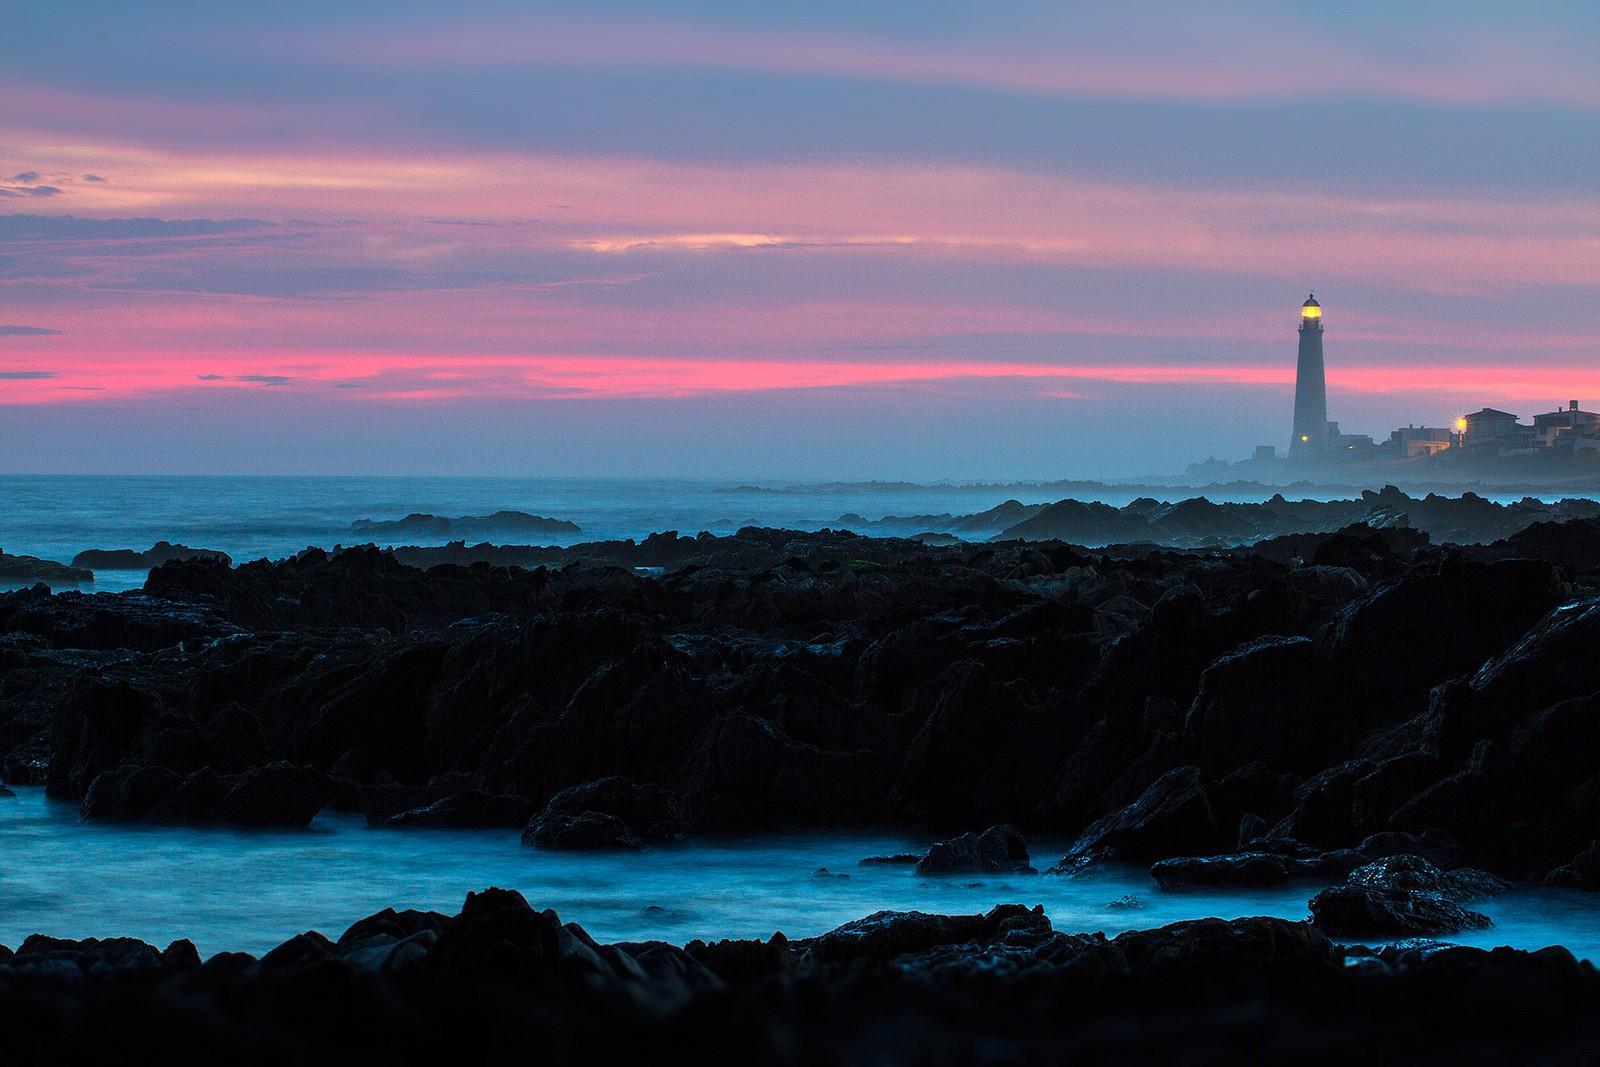 La Paloma lighthouse at sunset © Marcelo Campi / Flickr